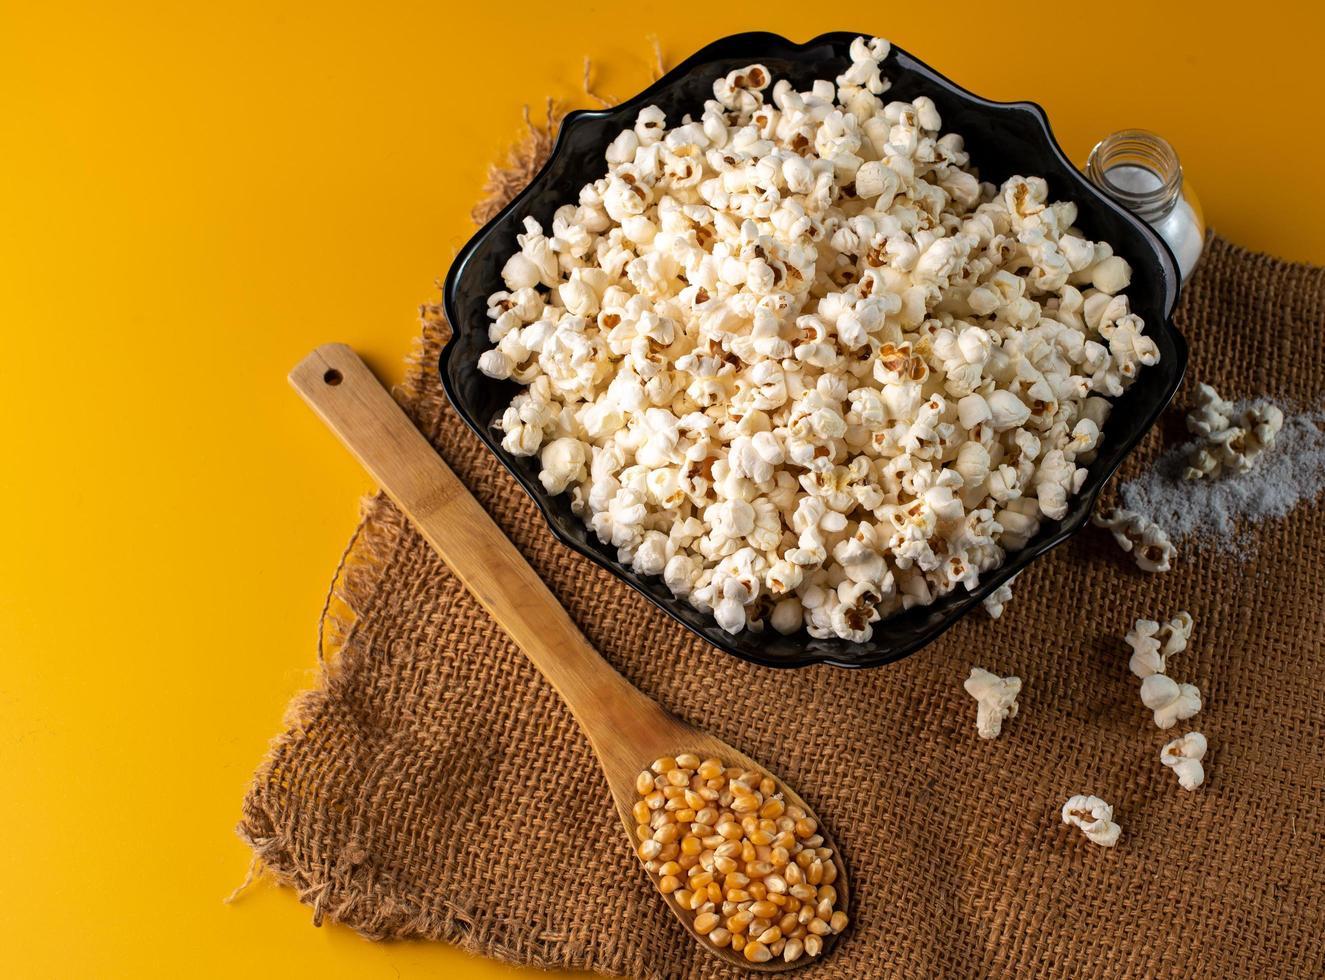 Bowl of popcorn on yellow background  photo